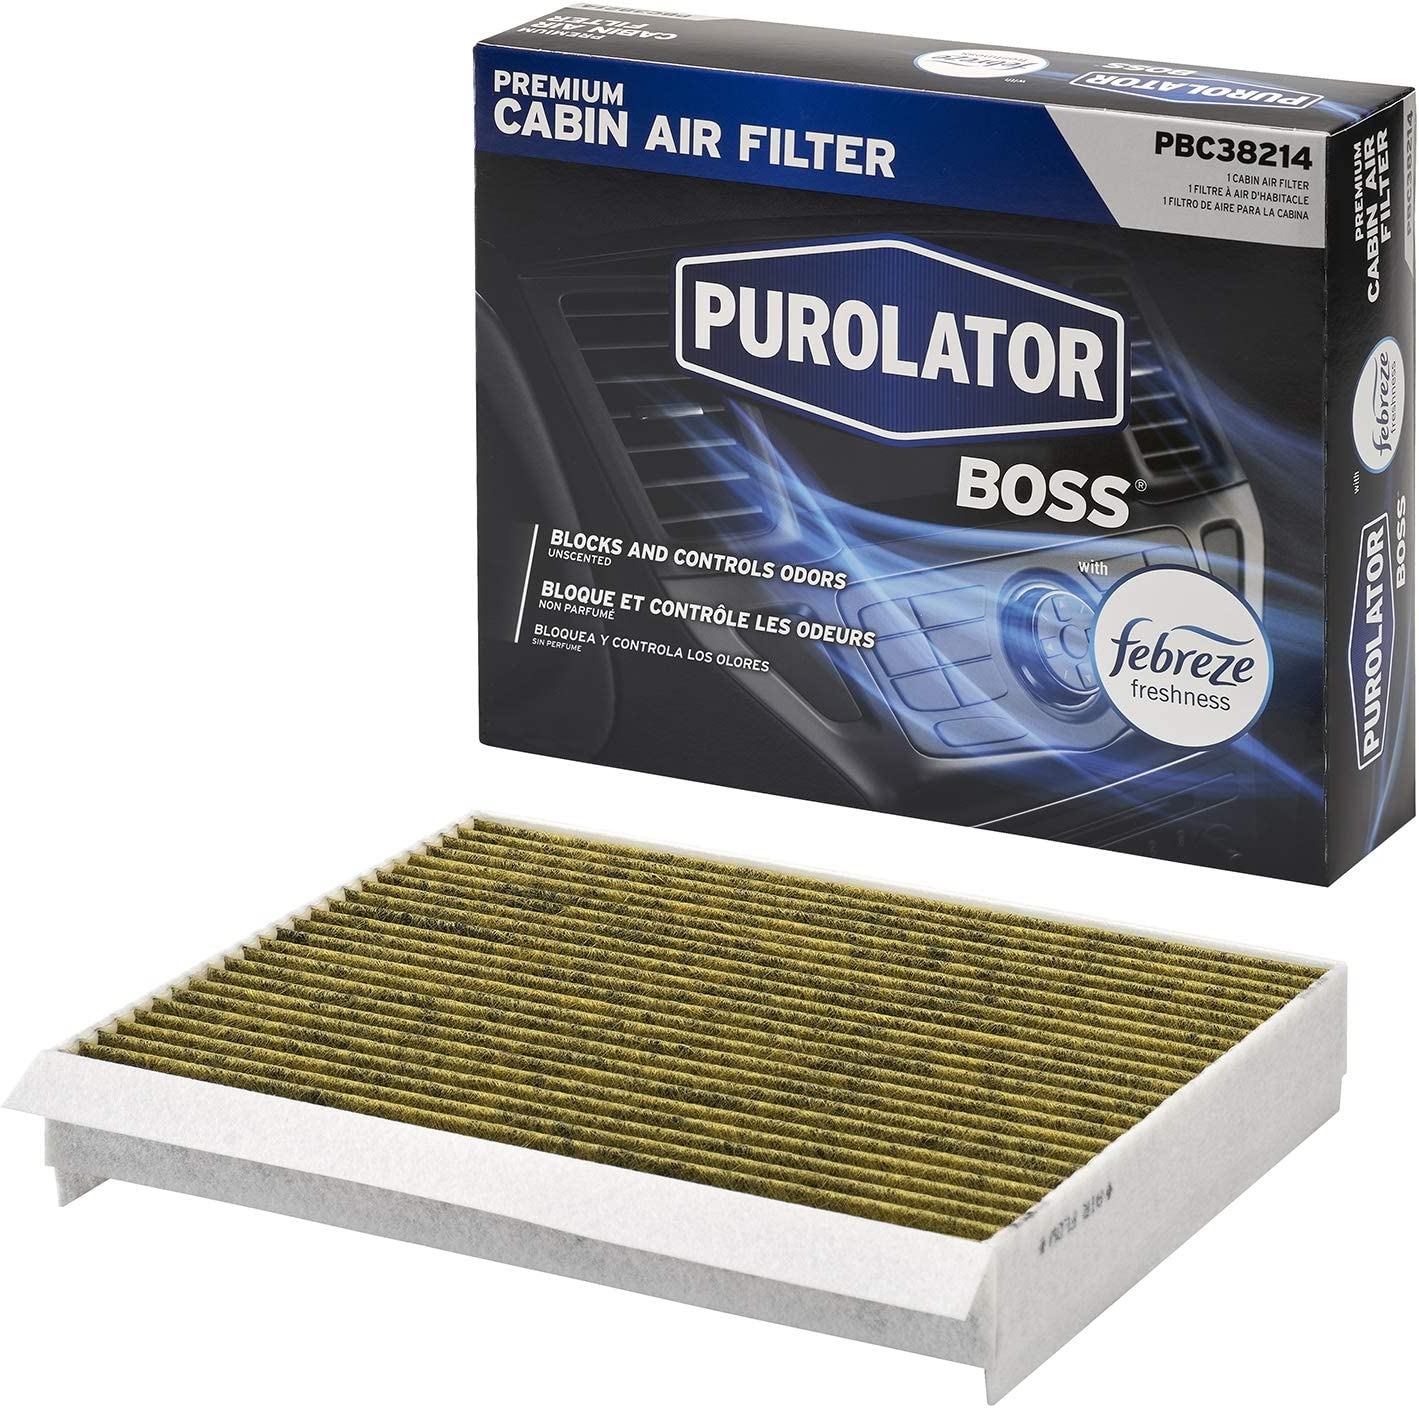 Purolator PBC38214 PurolatorBOSS Premium Ranking TOP3 Cabin F Deluxe with Air Filter